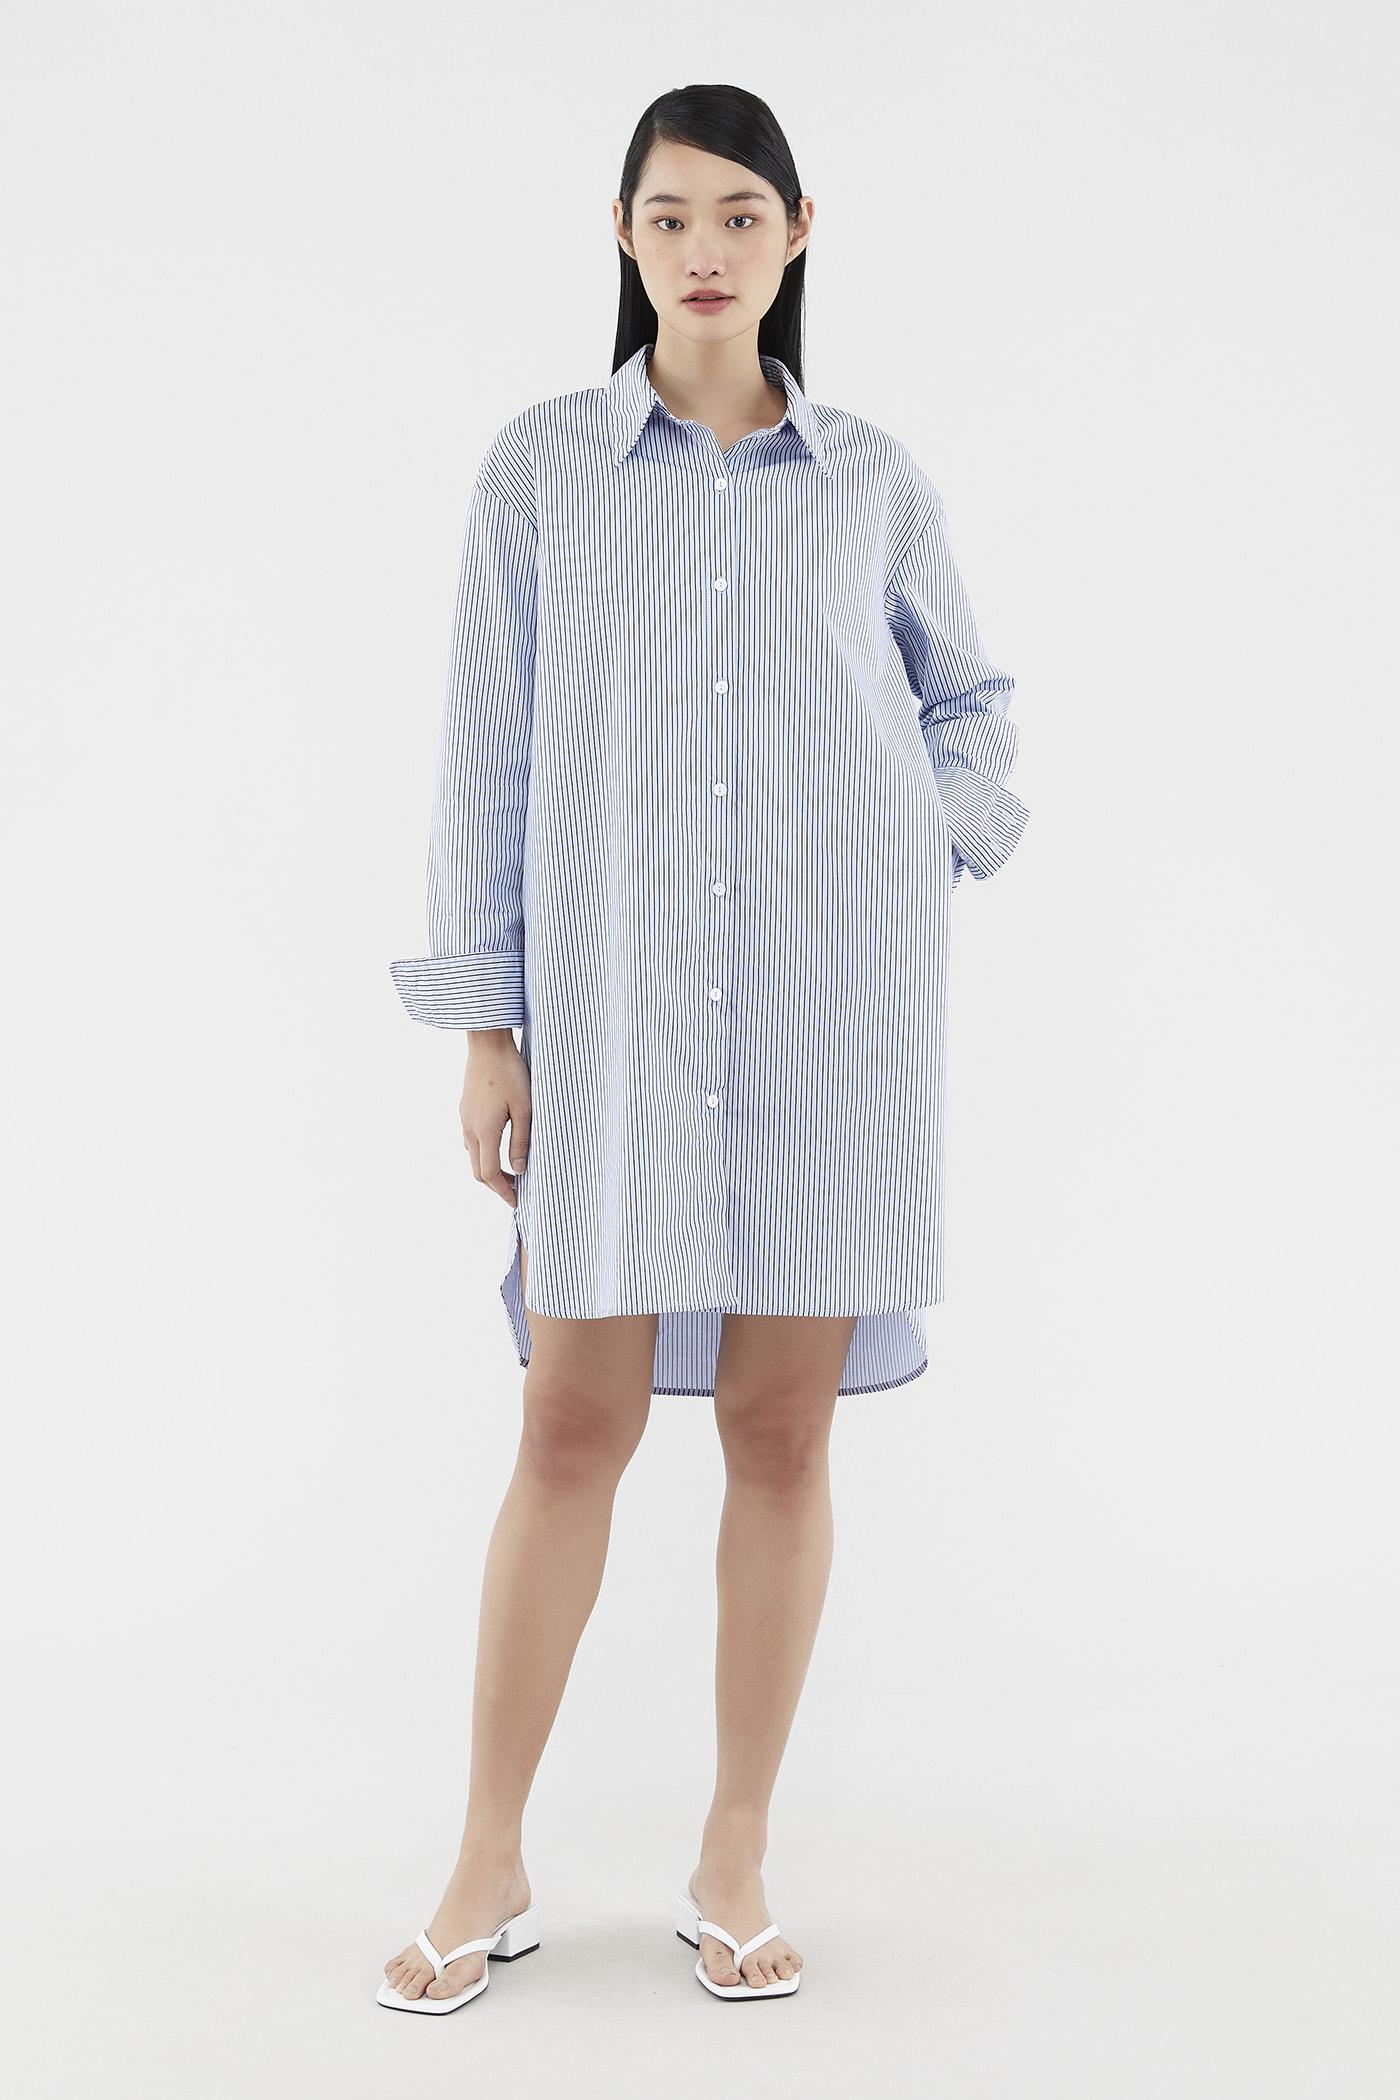 Evander Shirtdress